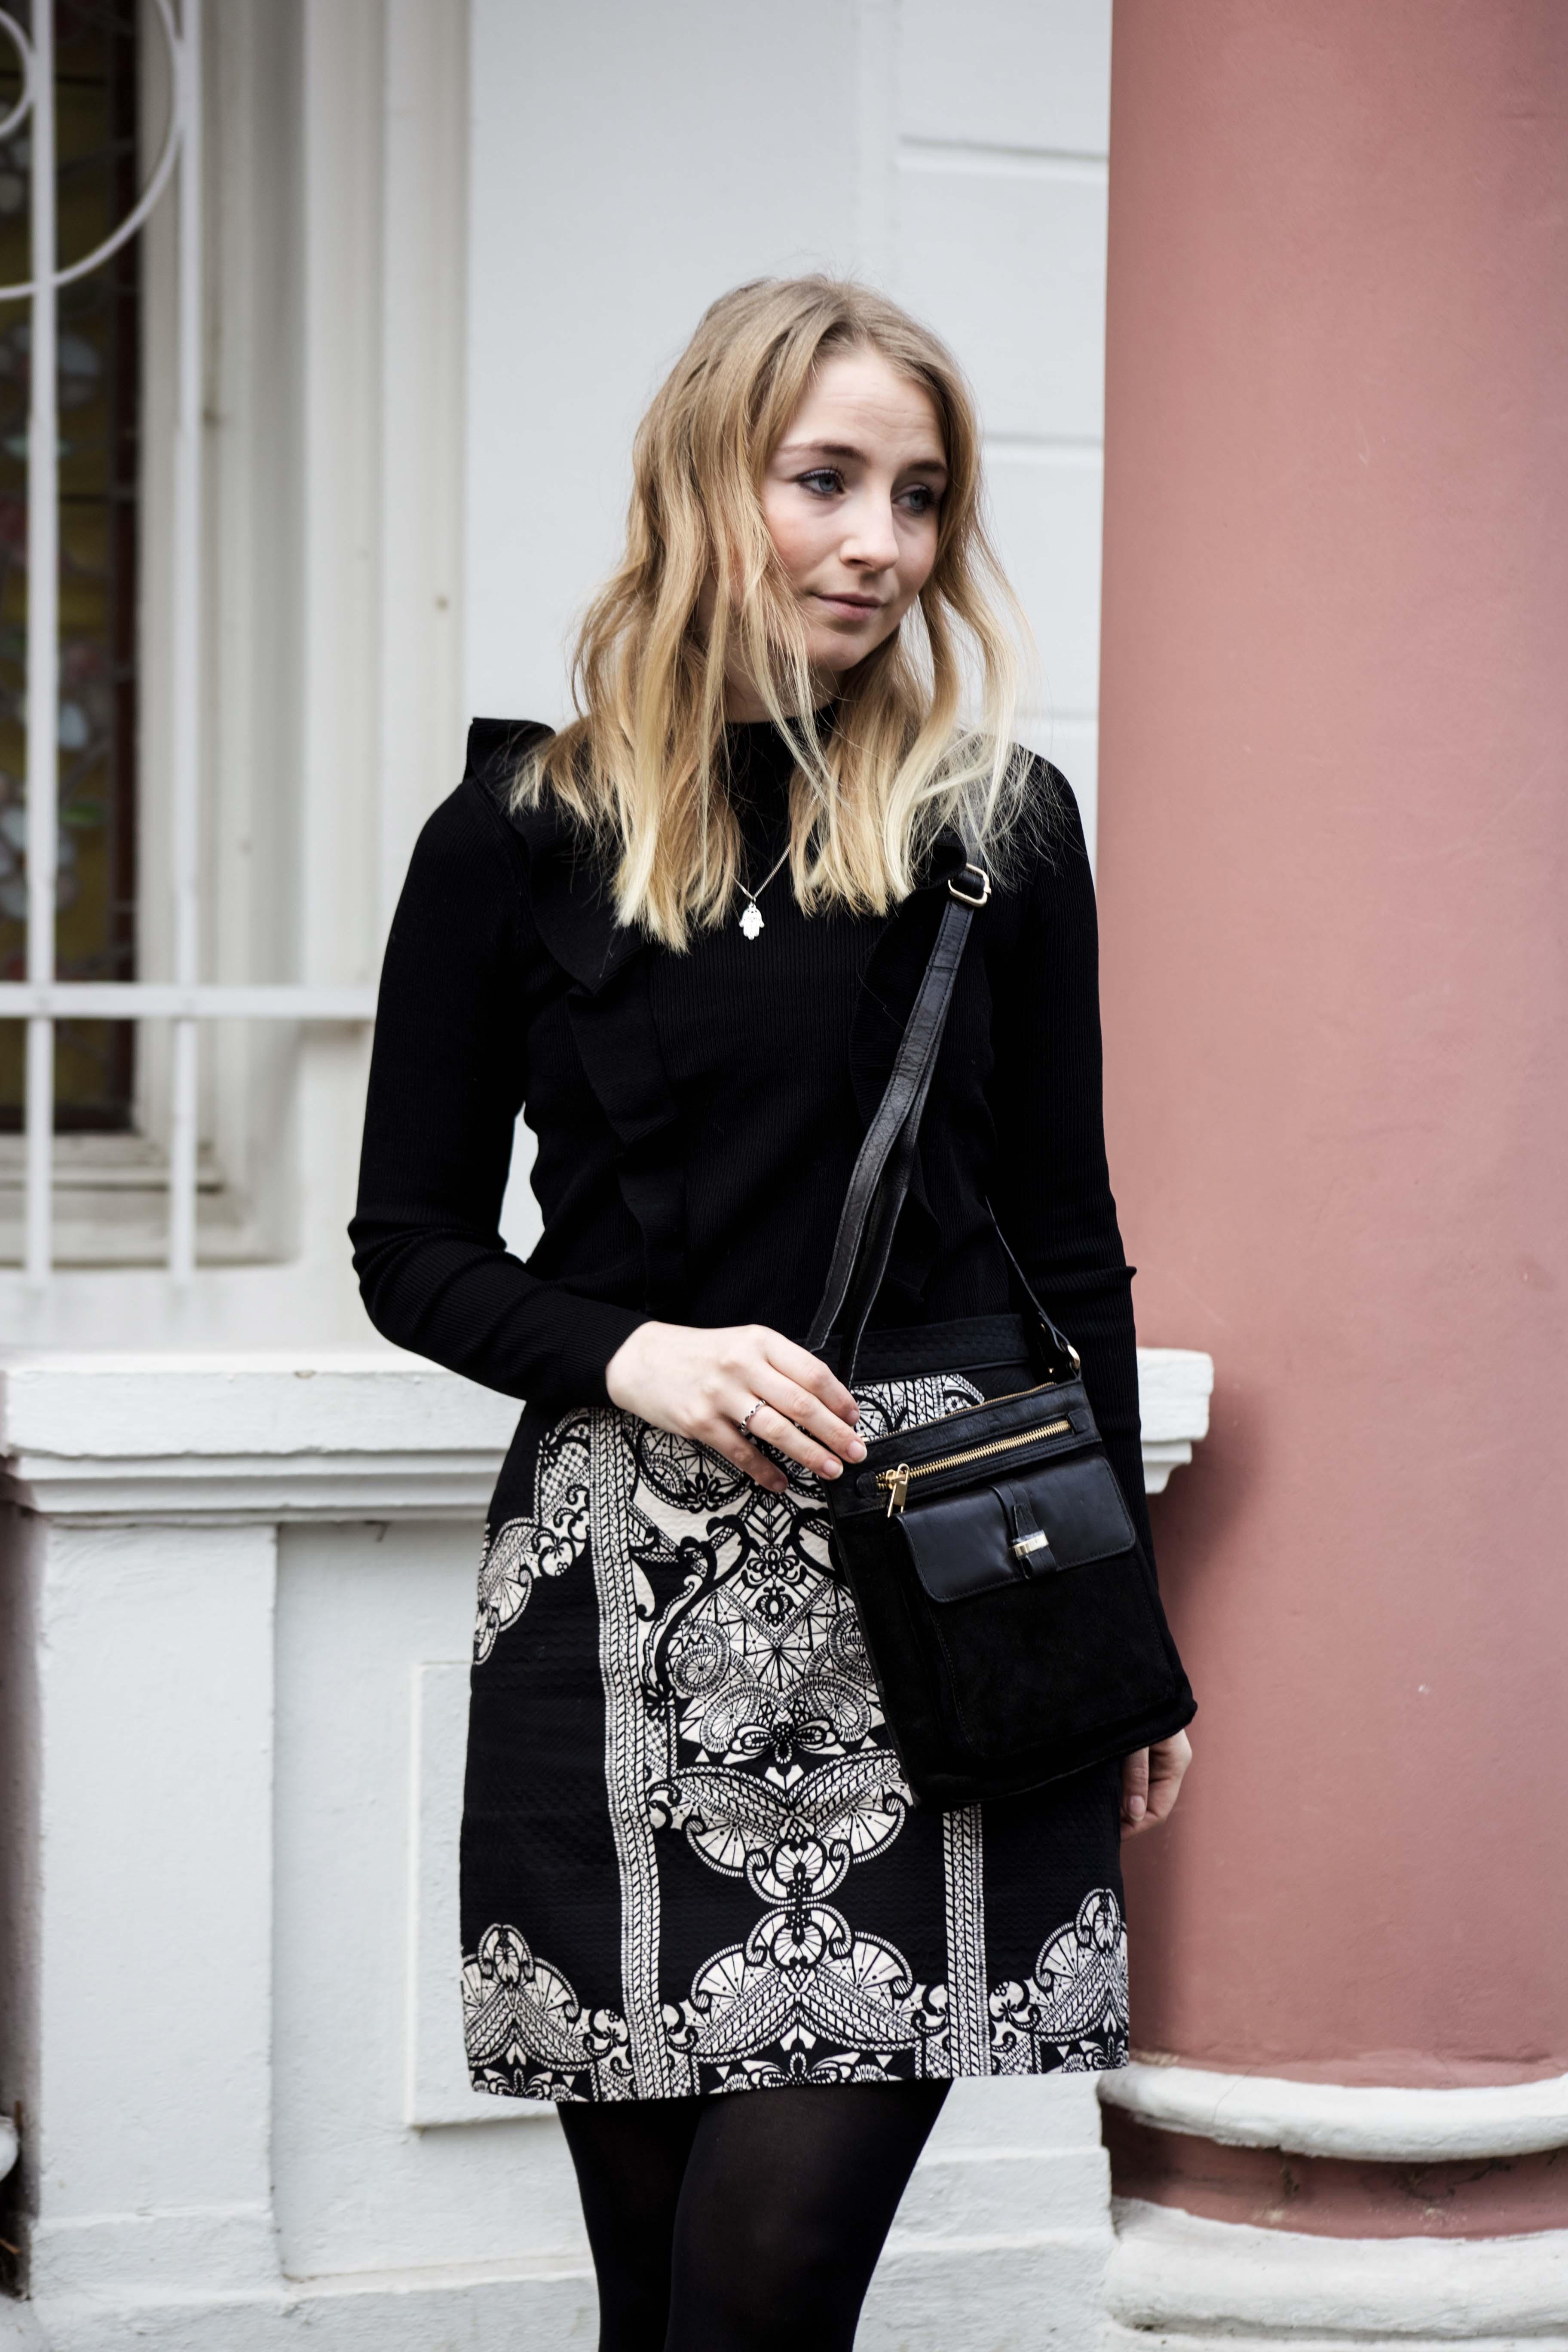 streetstyle-bonn-waldgrüner-mantel-rock-muster-print-fashionblogger-modeblog-mode-outfit_0124